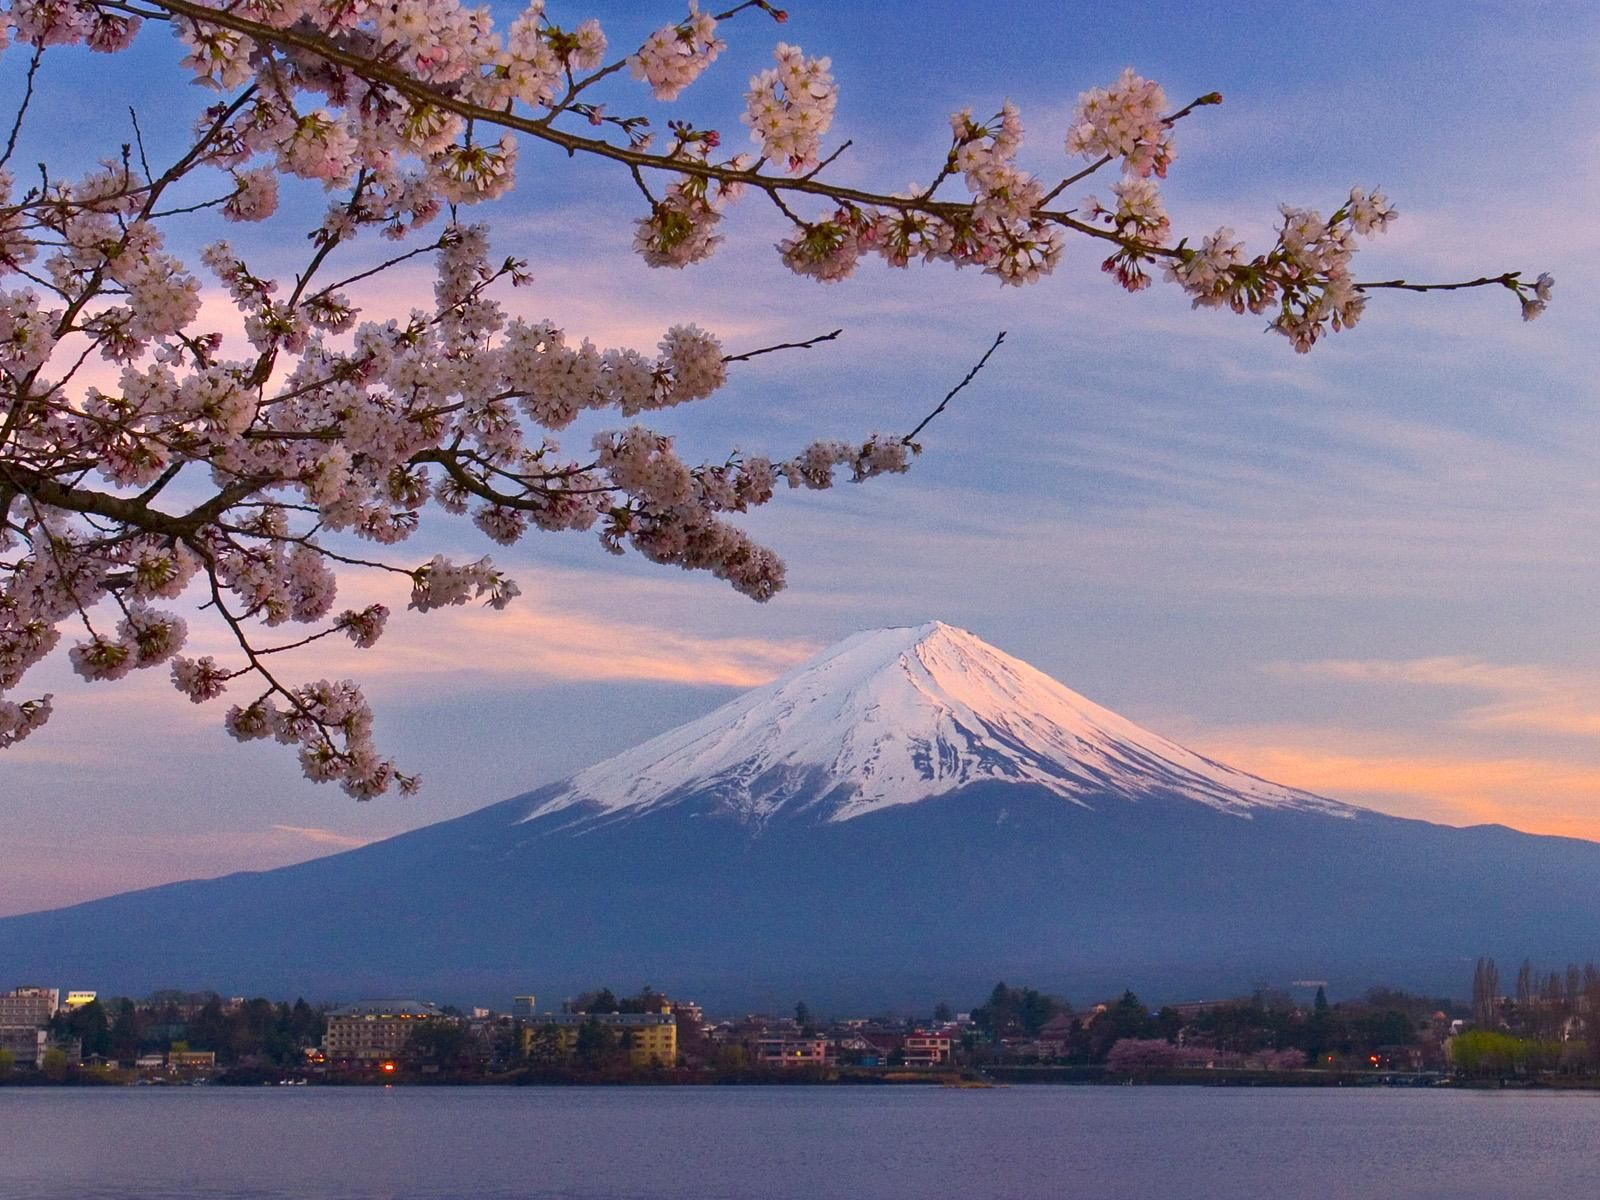 Cherry Blossoms Mount Fuji And Kawaguchi Lake 1600 X 1200 Mount Fuji Japan Mount Fuji Scenery Wallpaper